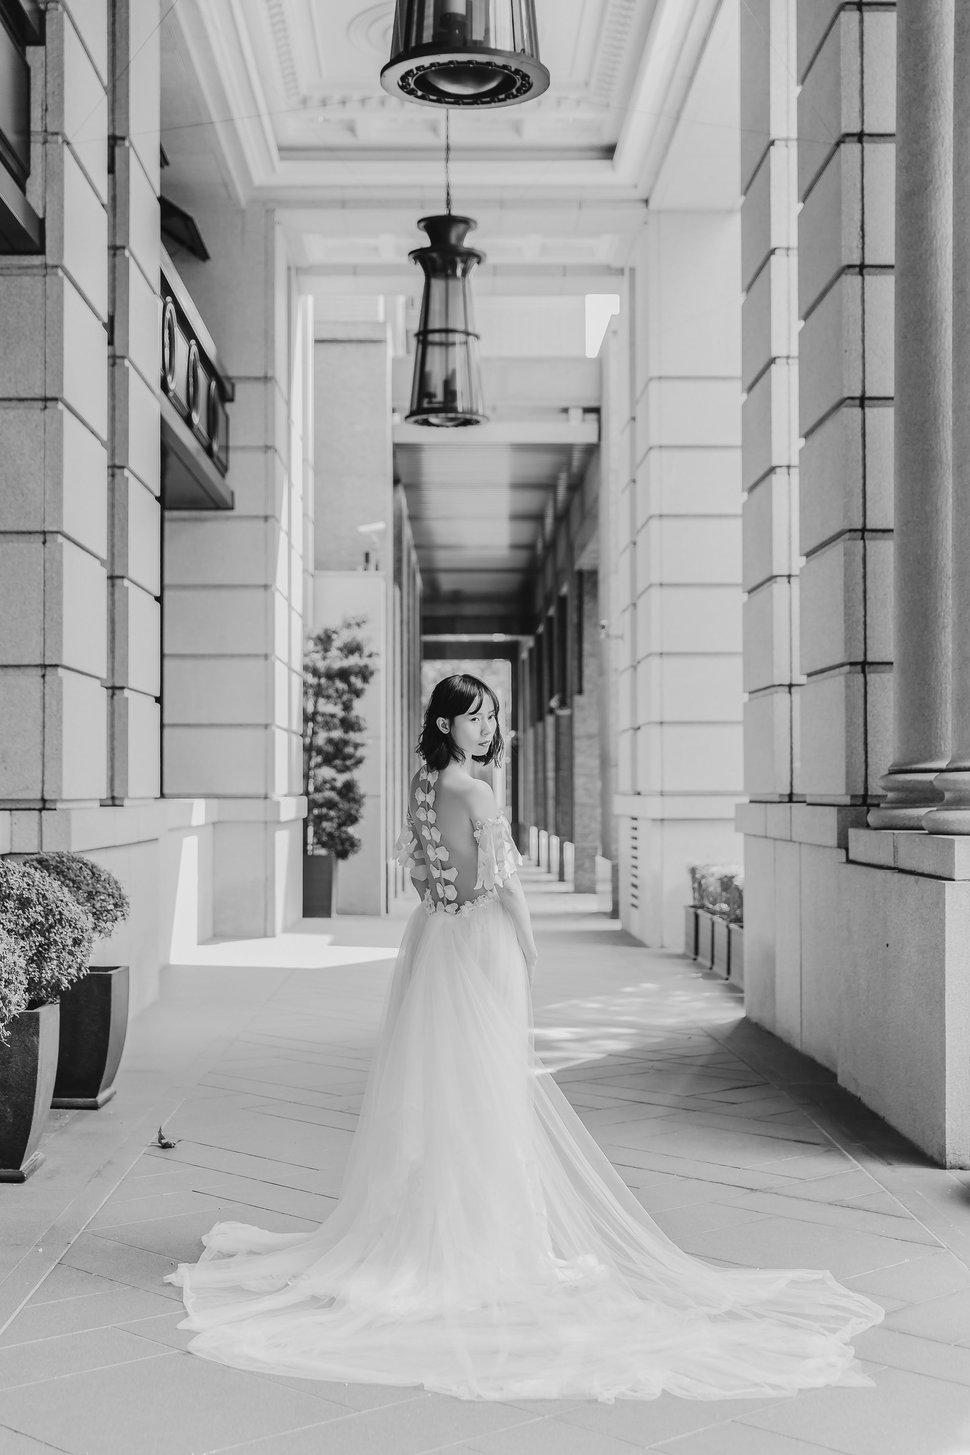 AG美式婚紗,AG美式婚禮紀錄,女婚攝,自助婚紗,自主婚紗,美式婚紗 ptt,Amazing Grace攝影美學,台中自助婚紗推薦,海外婚紗婚禮,自然清新婚紗 (29) - Amazing Grace Studio《結婚吧》